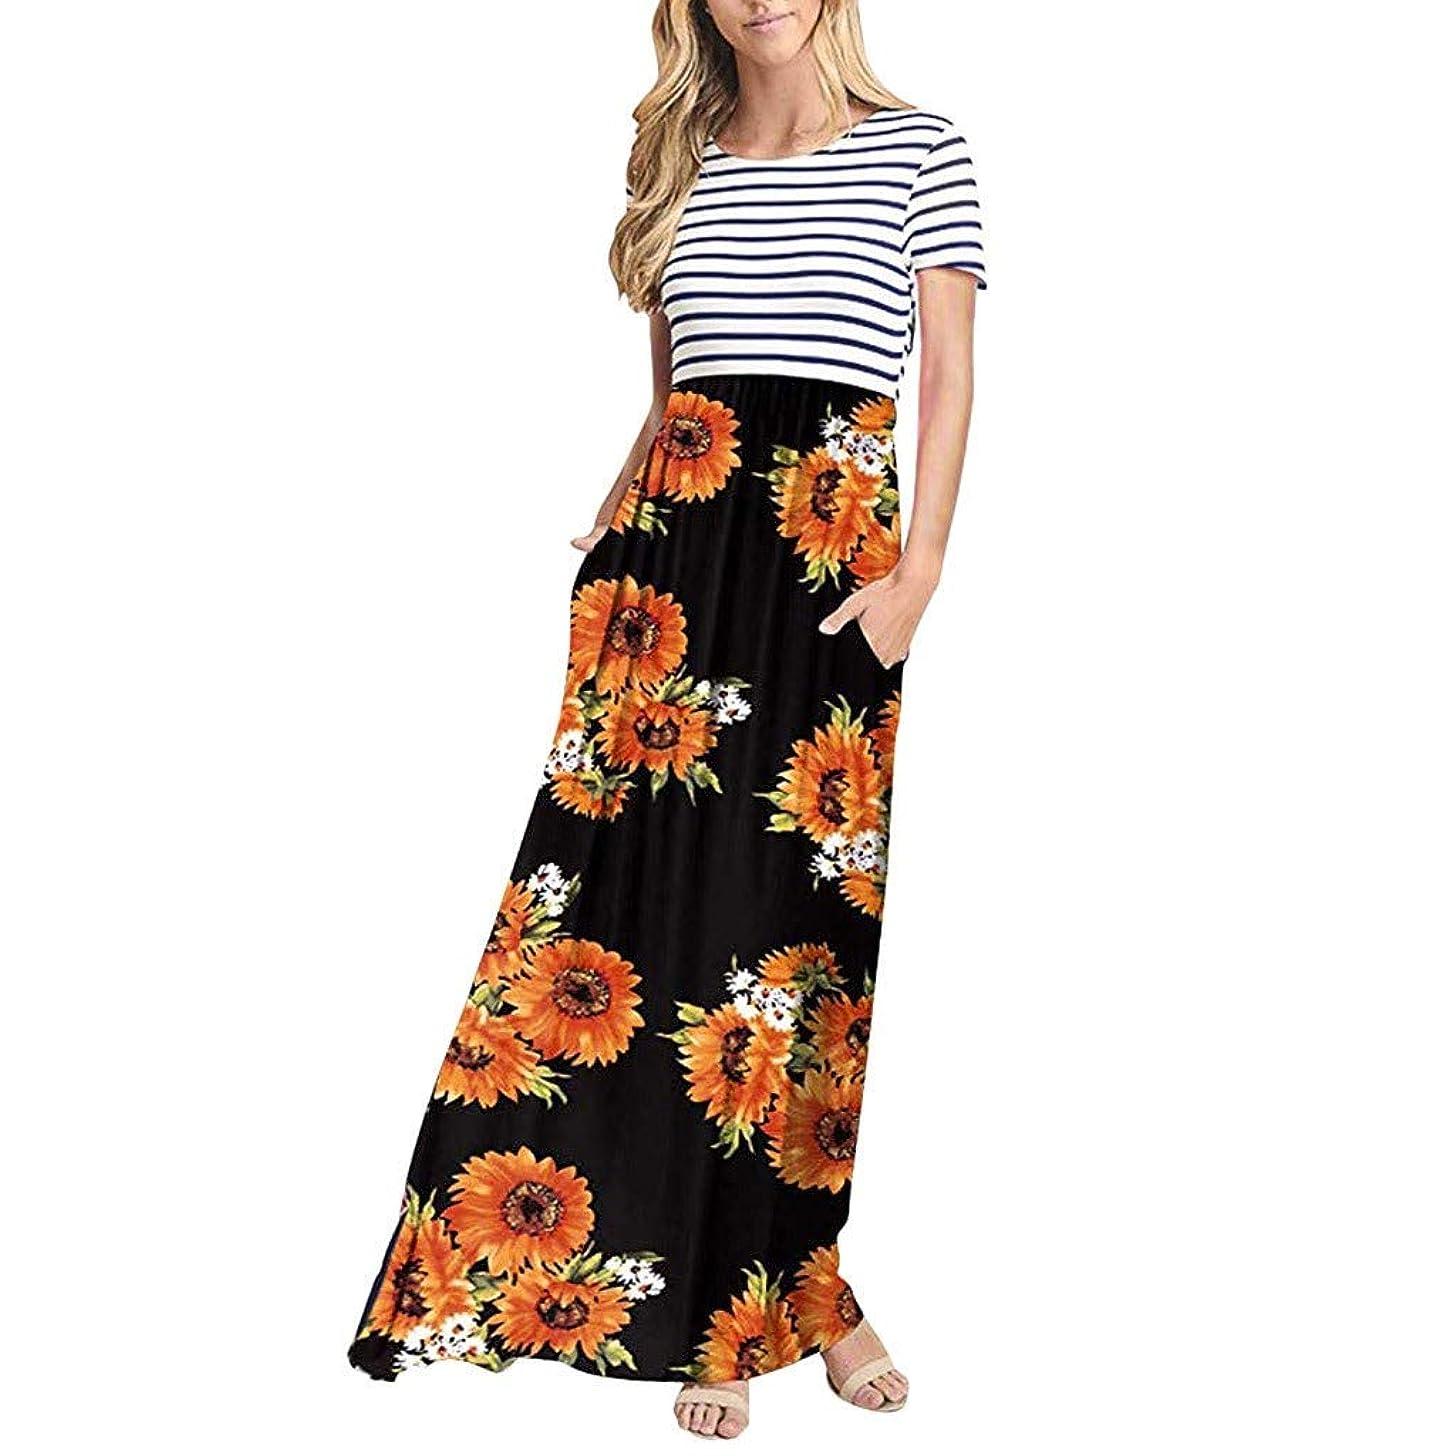 Women Stripe Maxi Dress High Waist Short Sleeve Scoop Neck Patchwork Floral Print Long Beach Dresses with Pockets